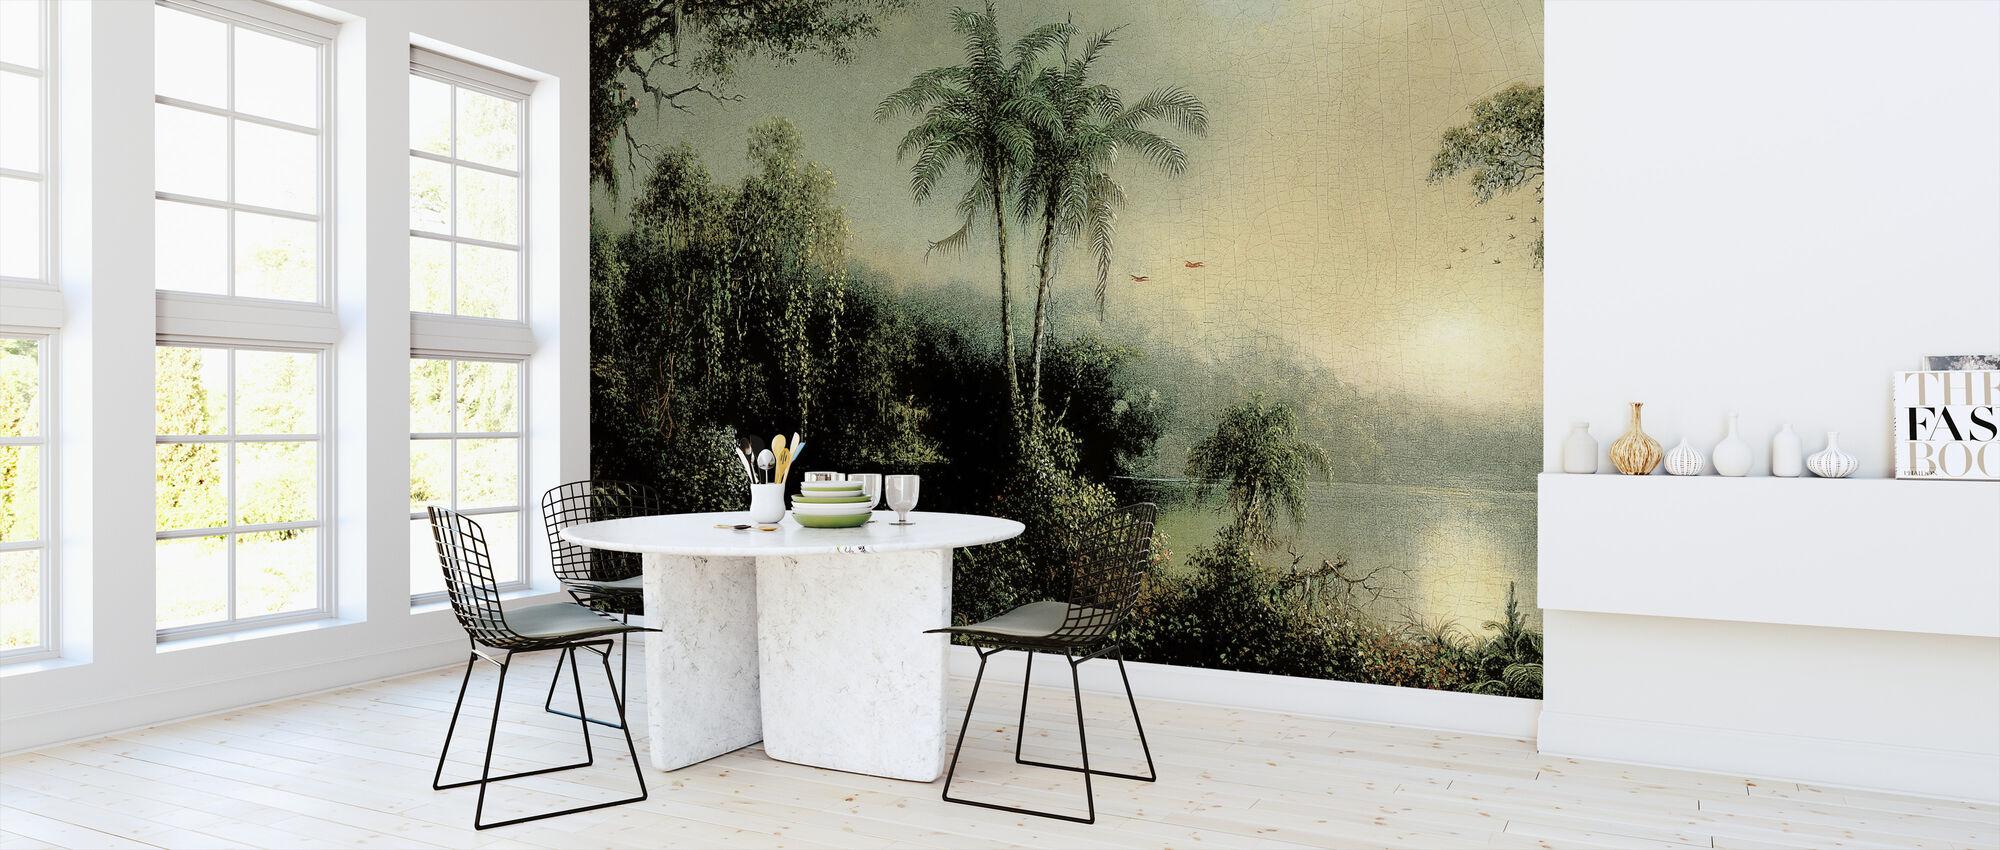 Sunrise - Martin Johnson Heade - Wallpaper - Kitchen